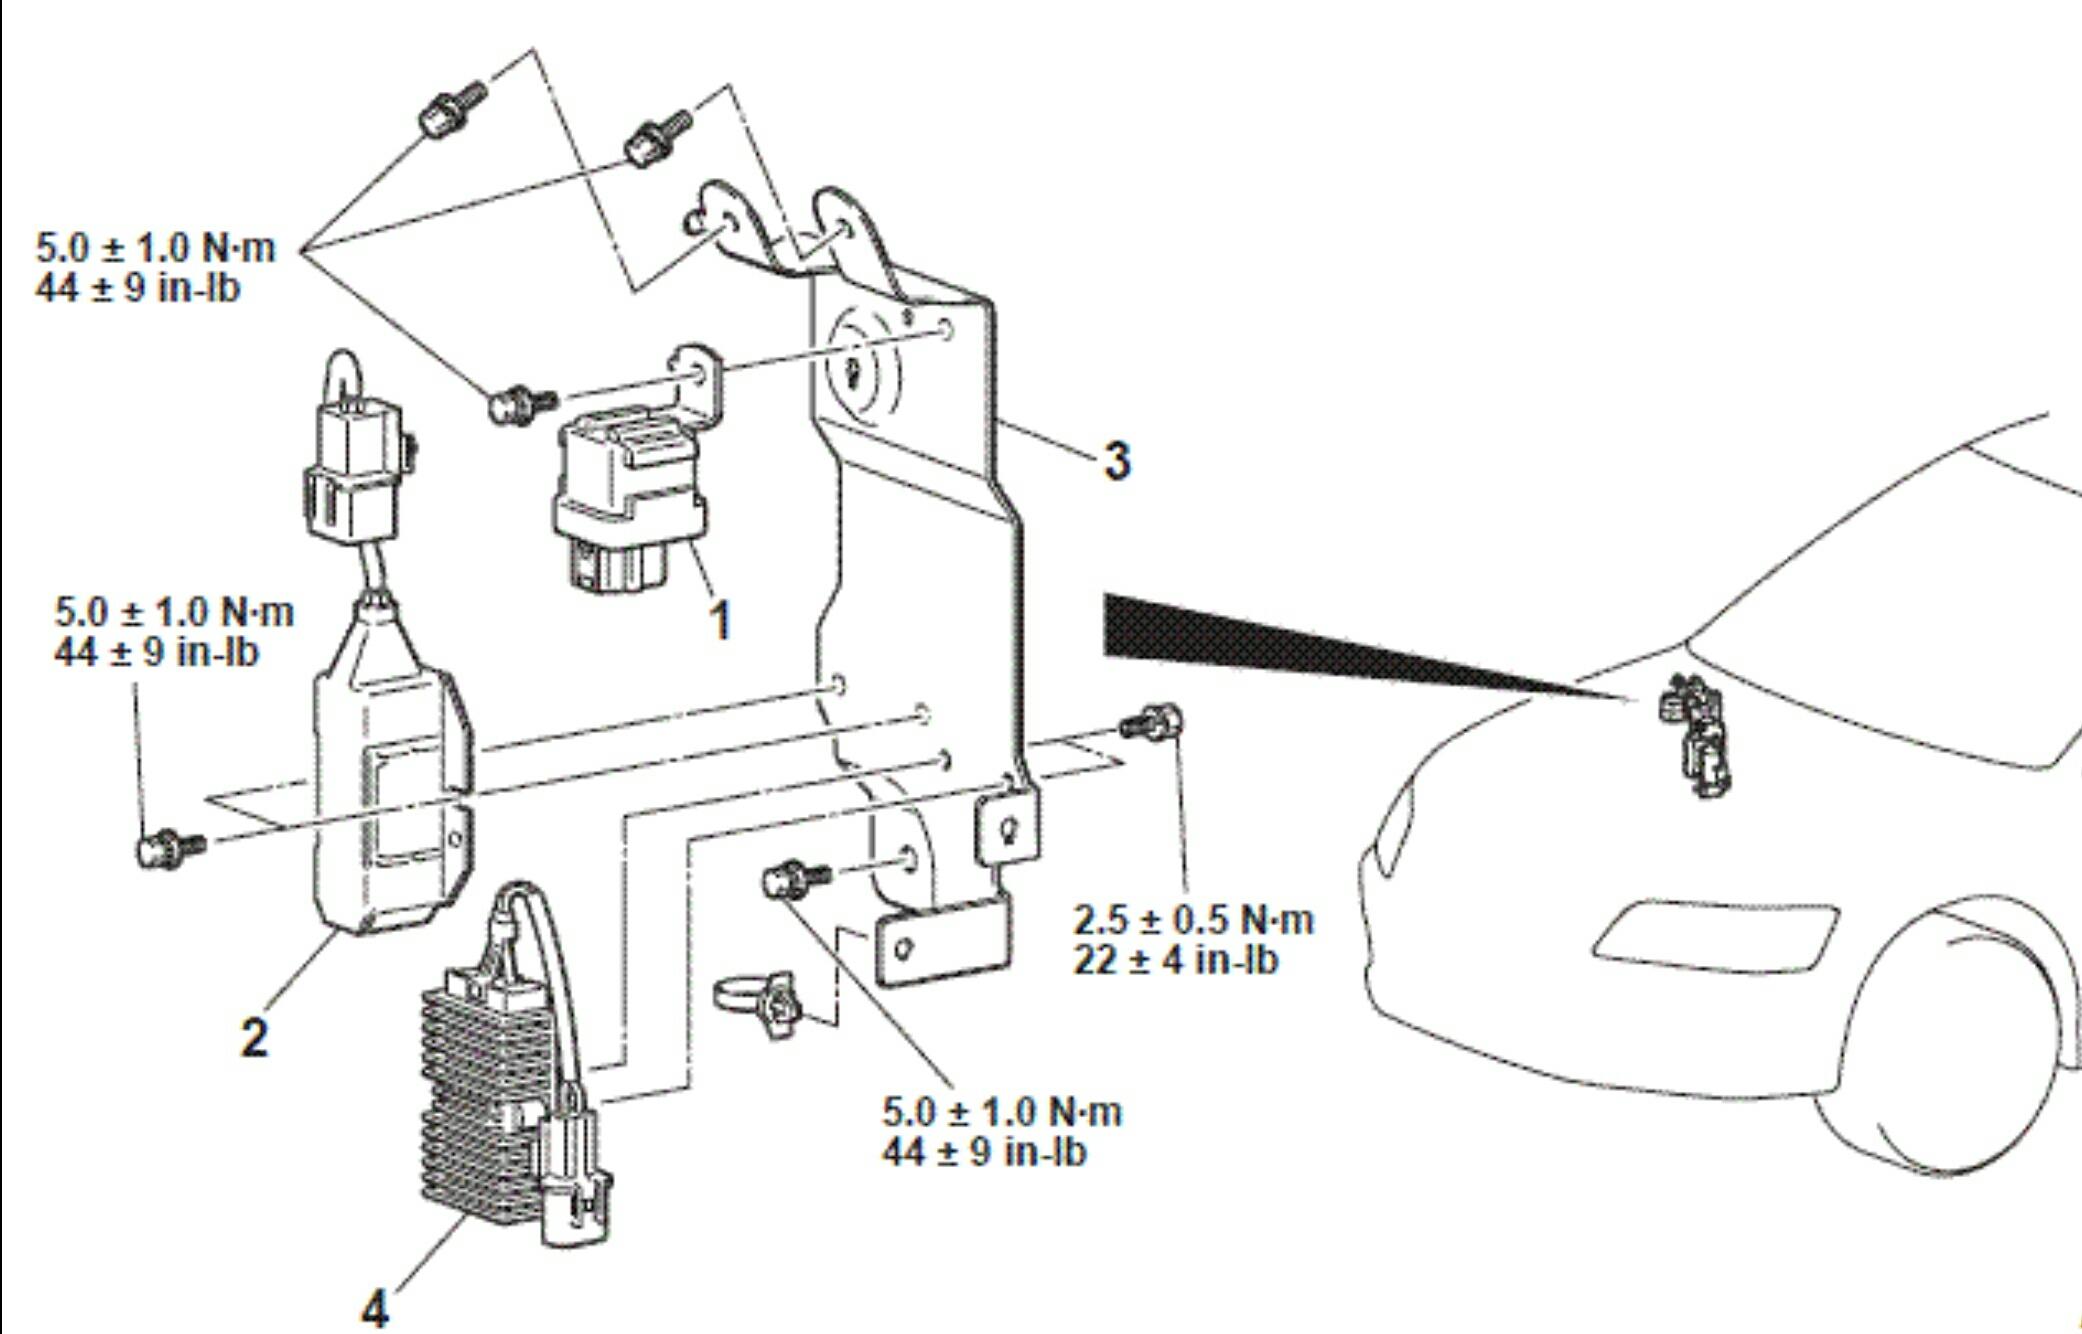 2002 mitsubishi lancer wiring diagram 1995 chevy lumina engine o2 sensor imageresizertool com